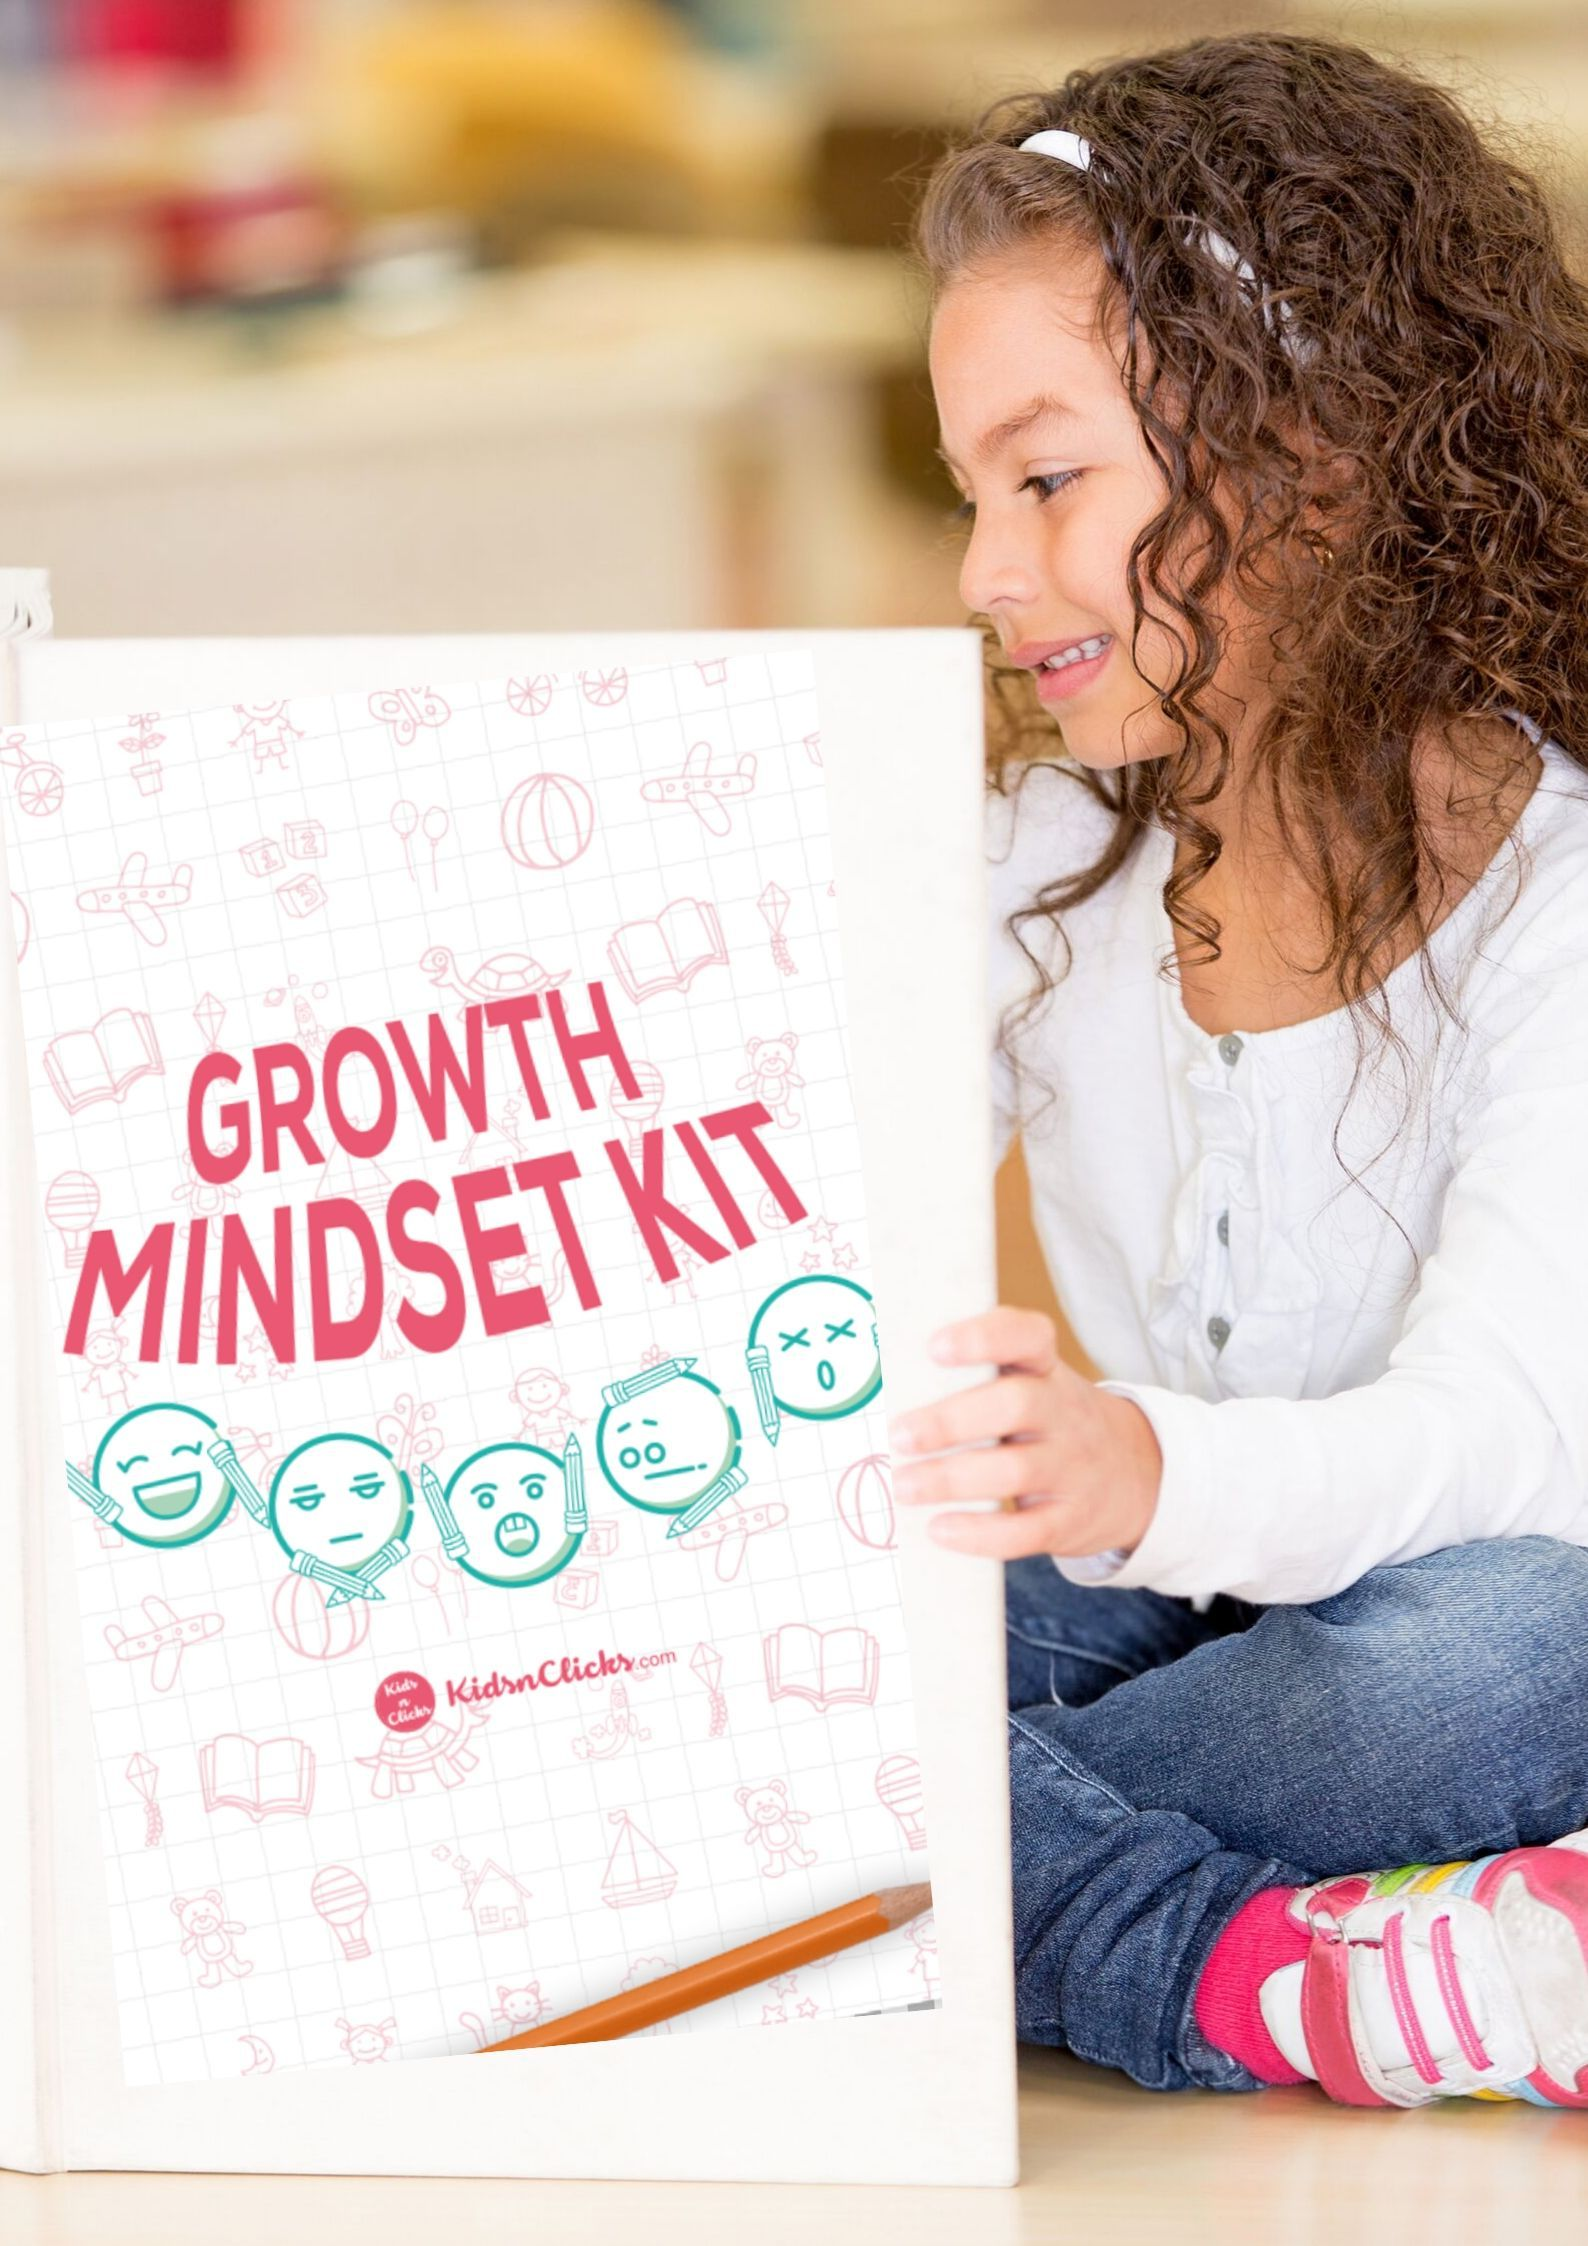 Growth Mindset Printables Kit 5 12 Years Old